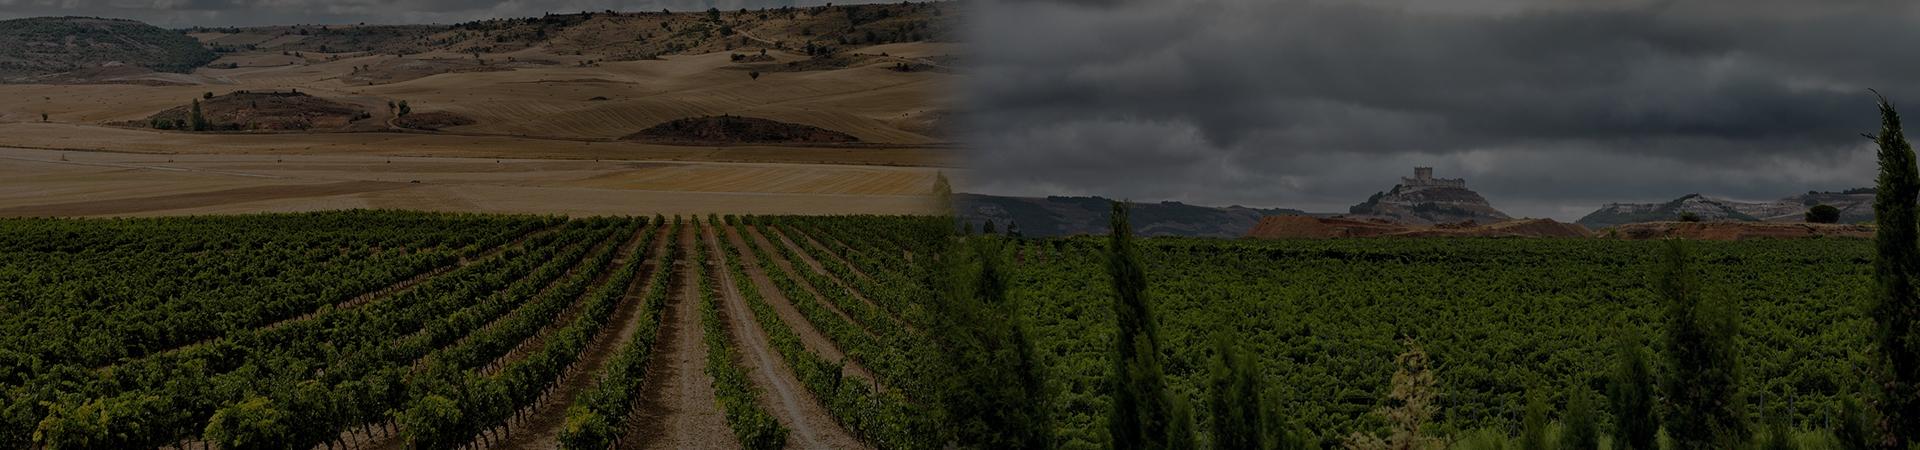 Alma Serena, Bodegas Penafiel, Ribera Del Duero